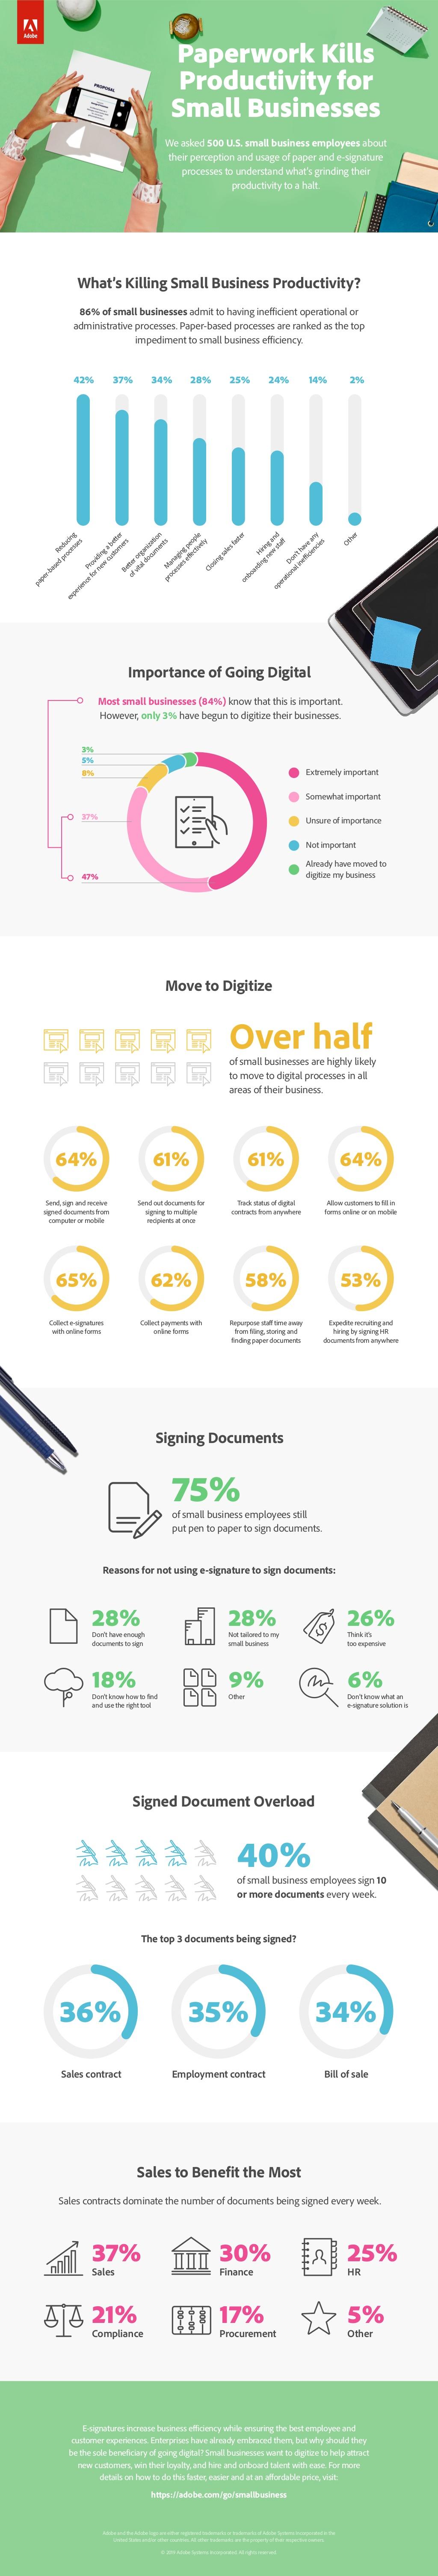 Paperwork kills productivity infographic